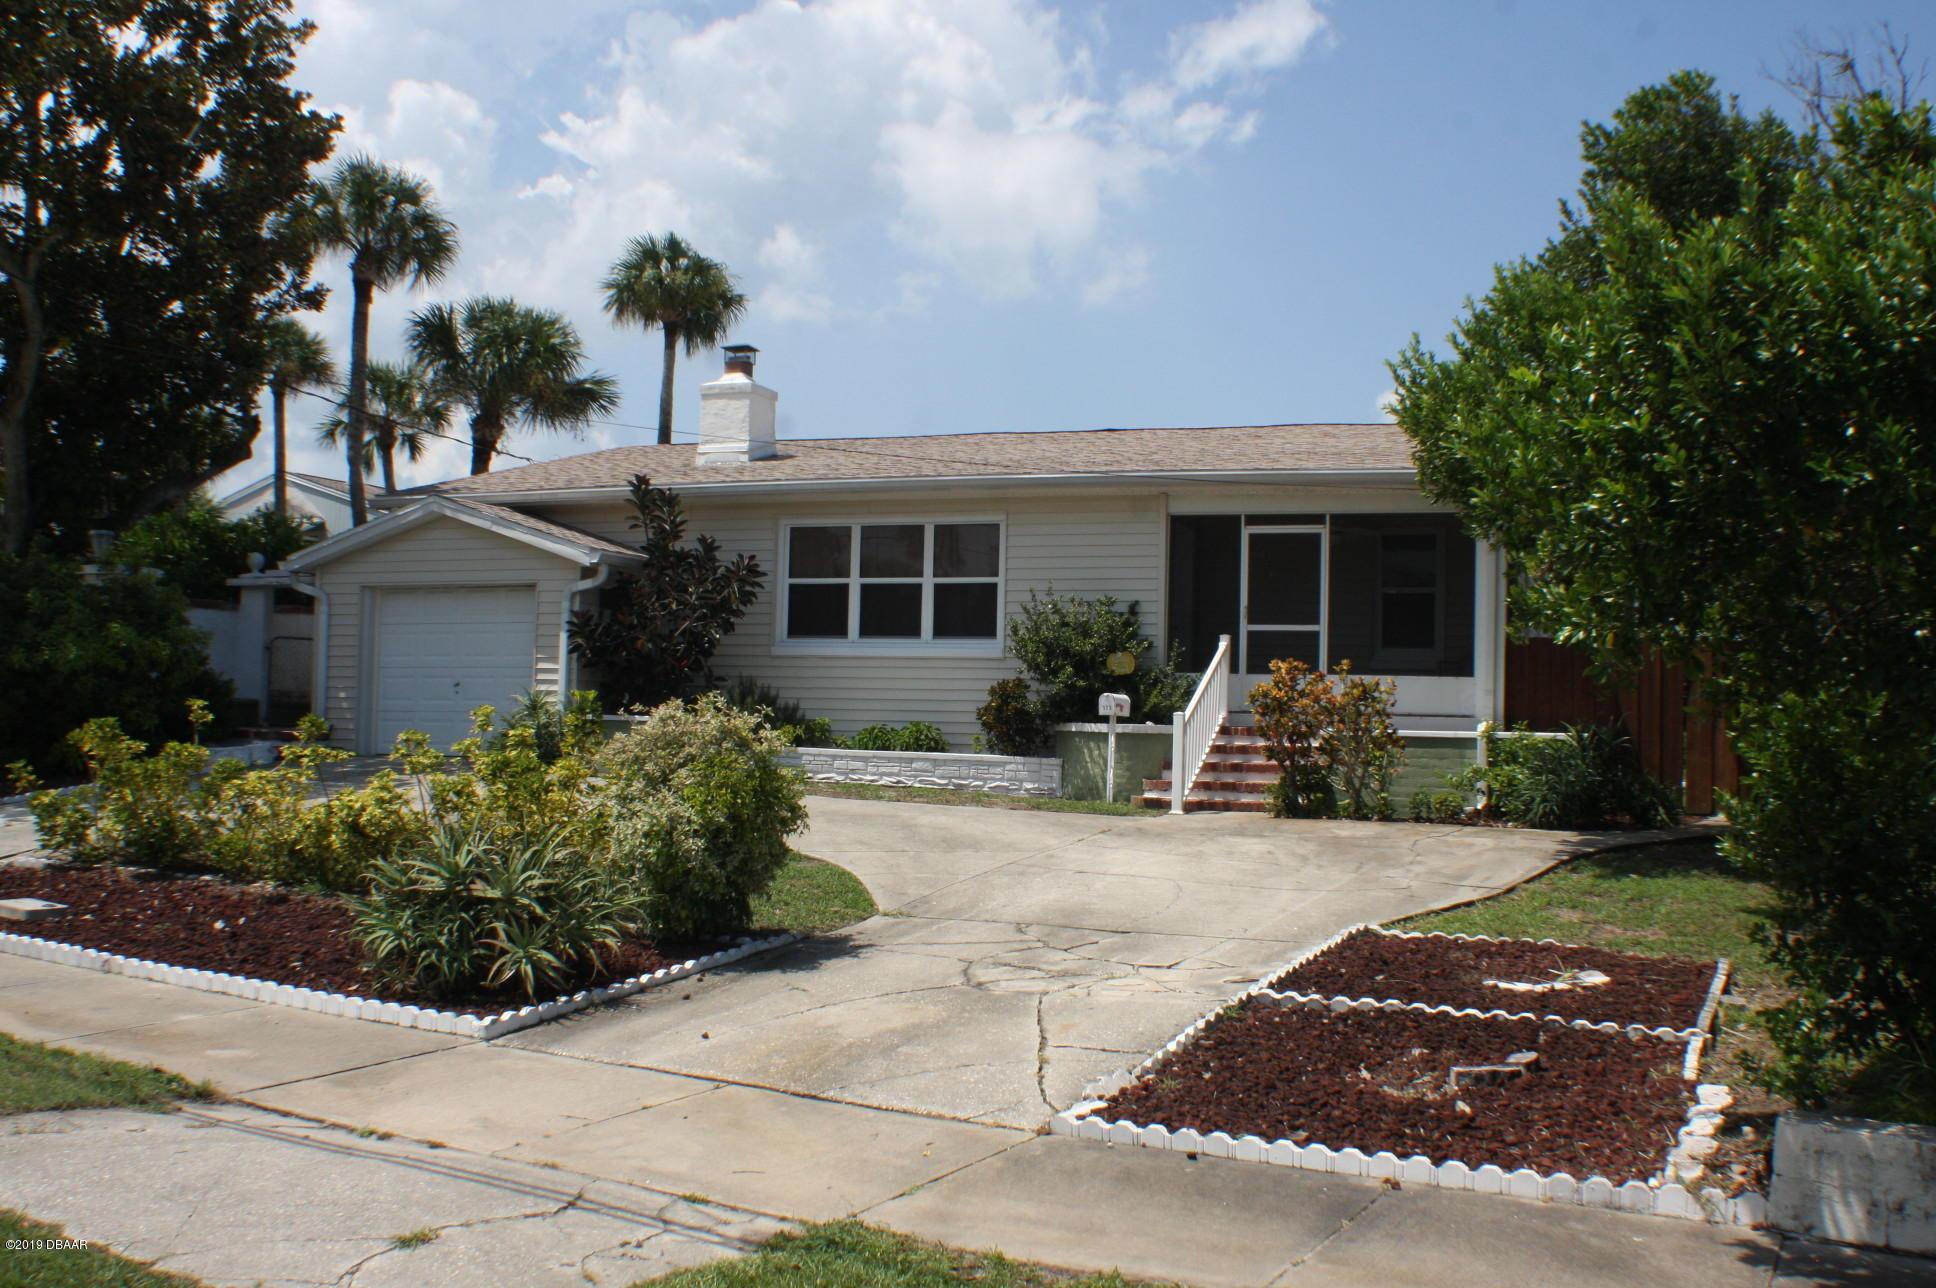 Photo of 323 Wisteria Road, Daytona Beach, FL 32118